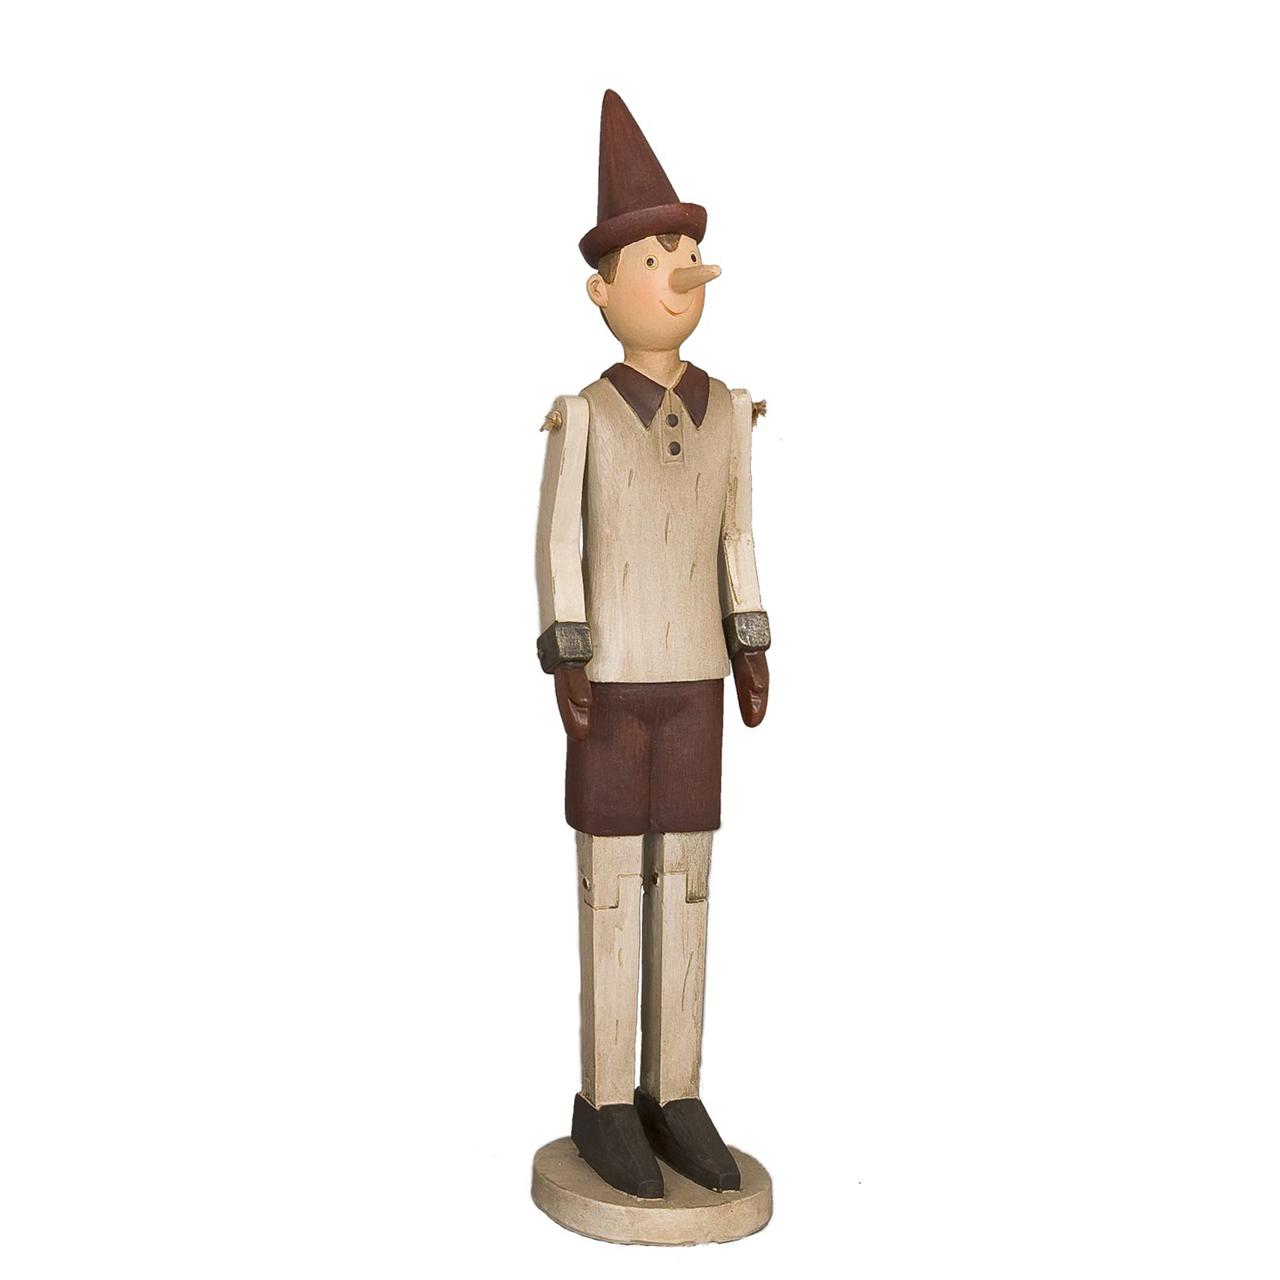 Statueta Pinochio Din Lemn Bej Cu Rosu 19.5 Cm